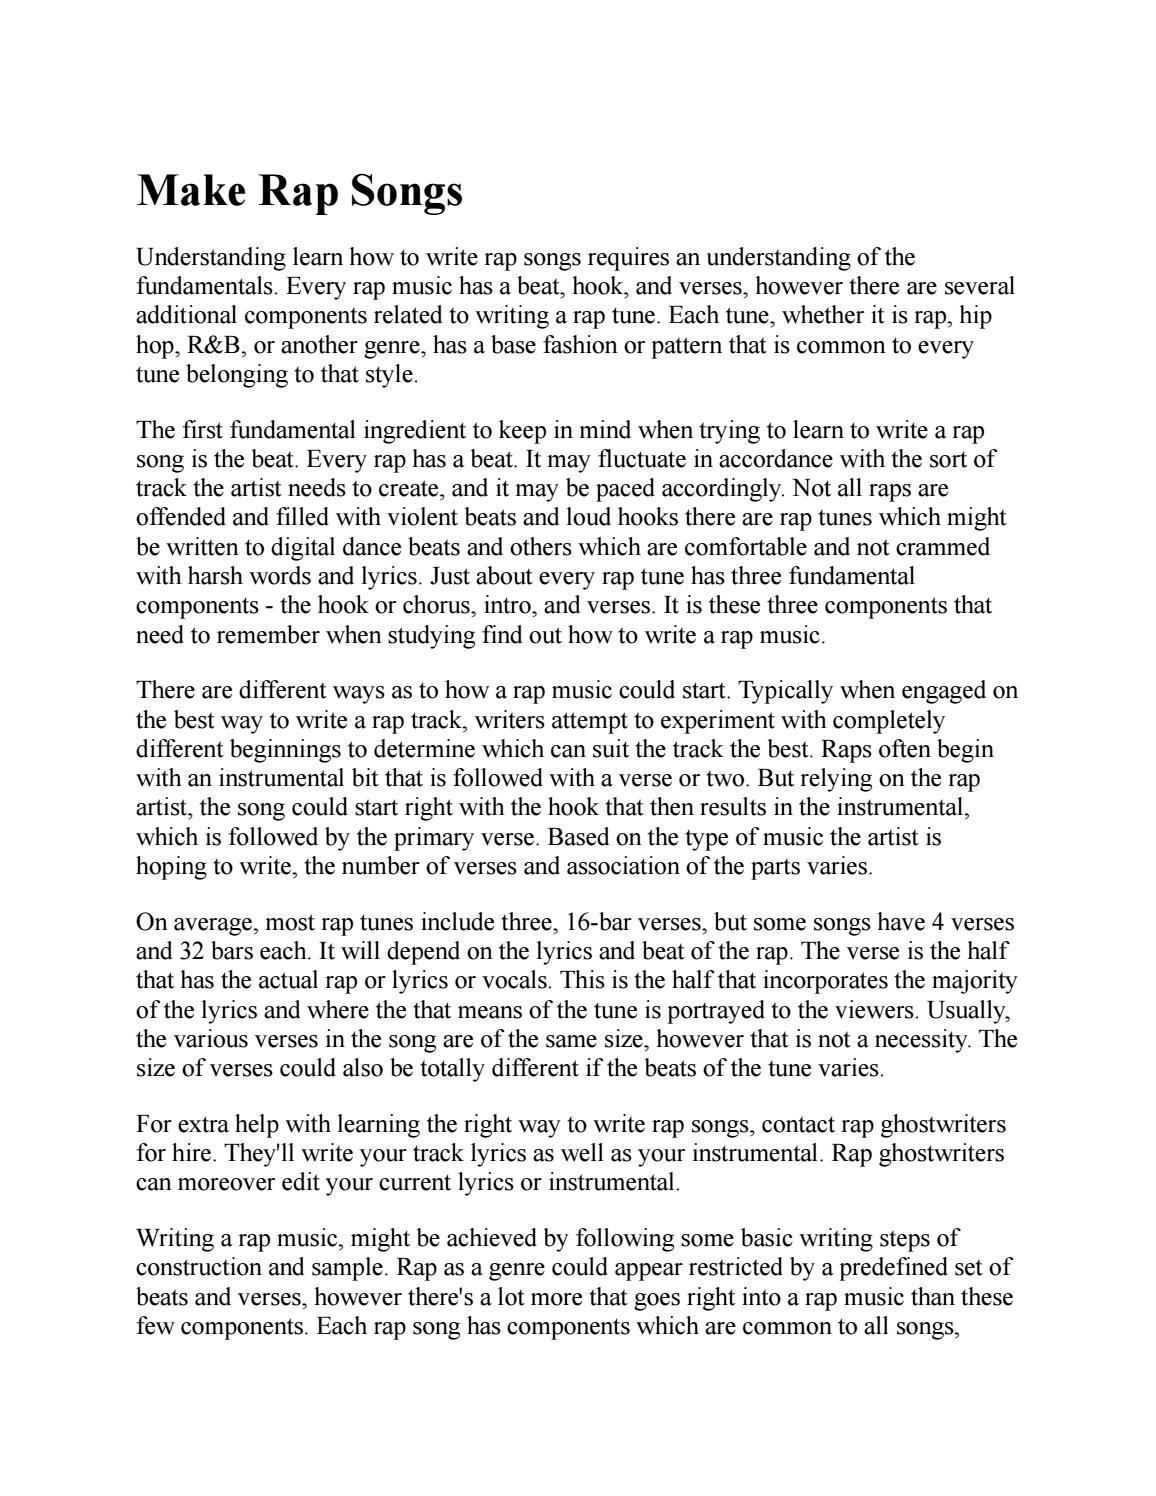 Ghostwriter lyrics for sale bachelorarbeit gesundheitsokonomie